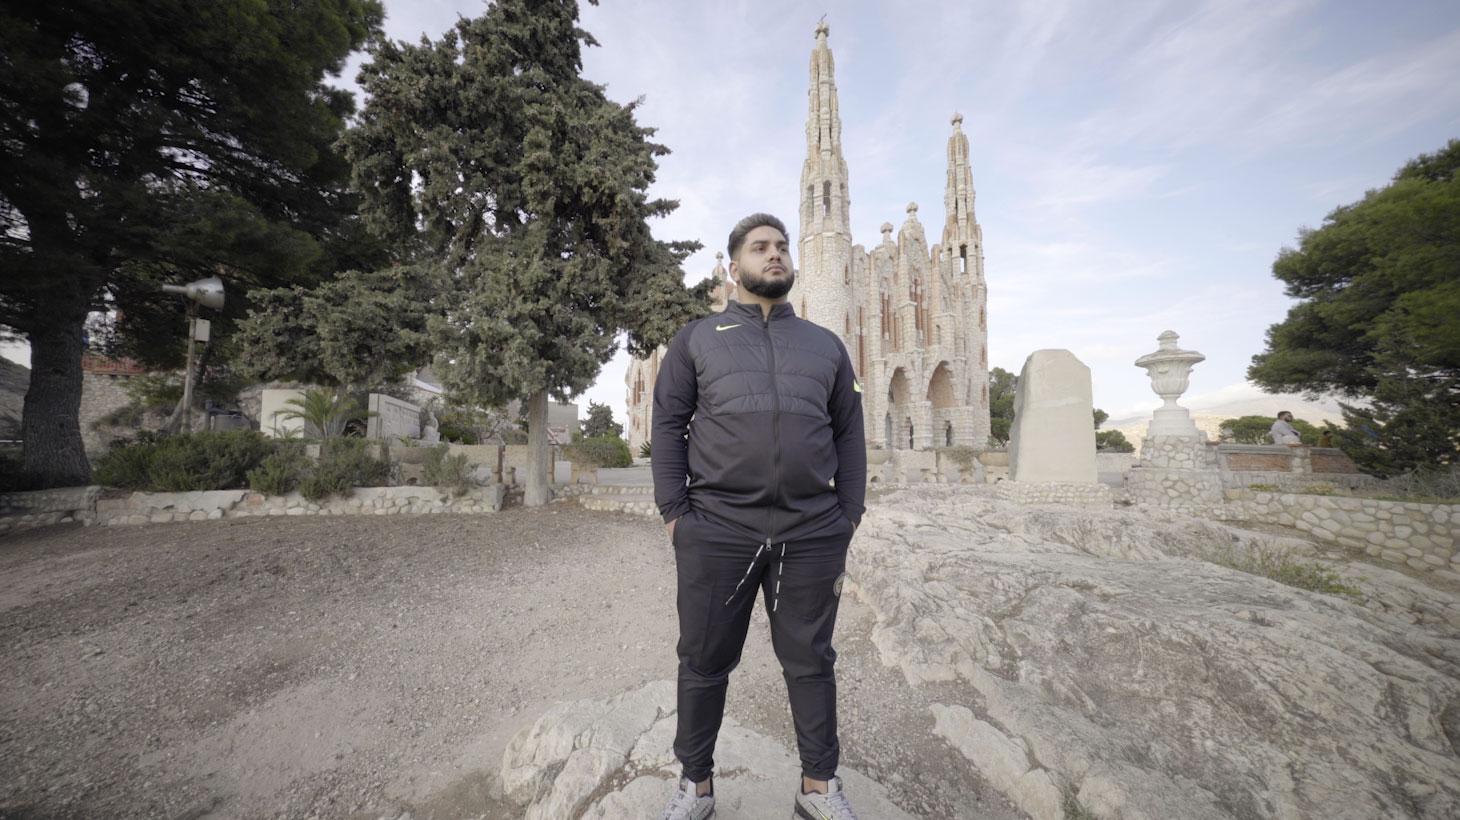 Chez Daviles de Novelda, le chanteur gitan qui mixe reggaeton et flamenco